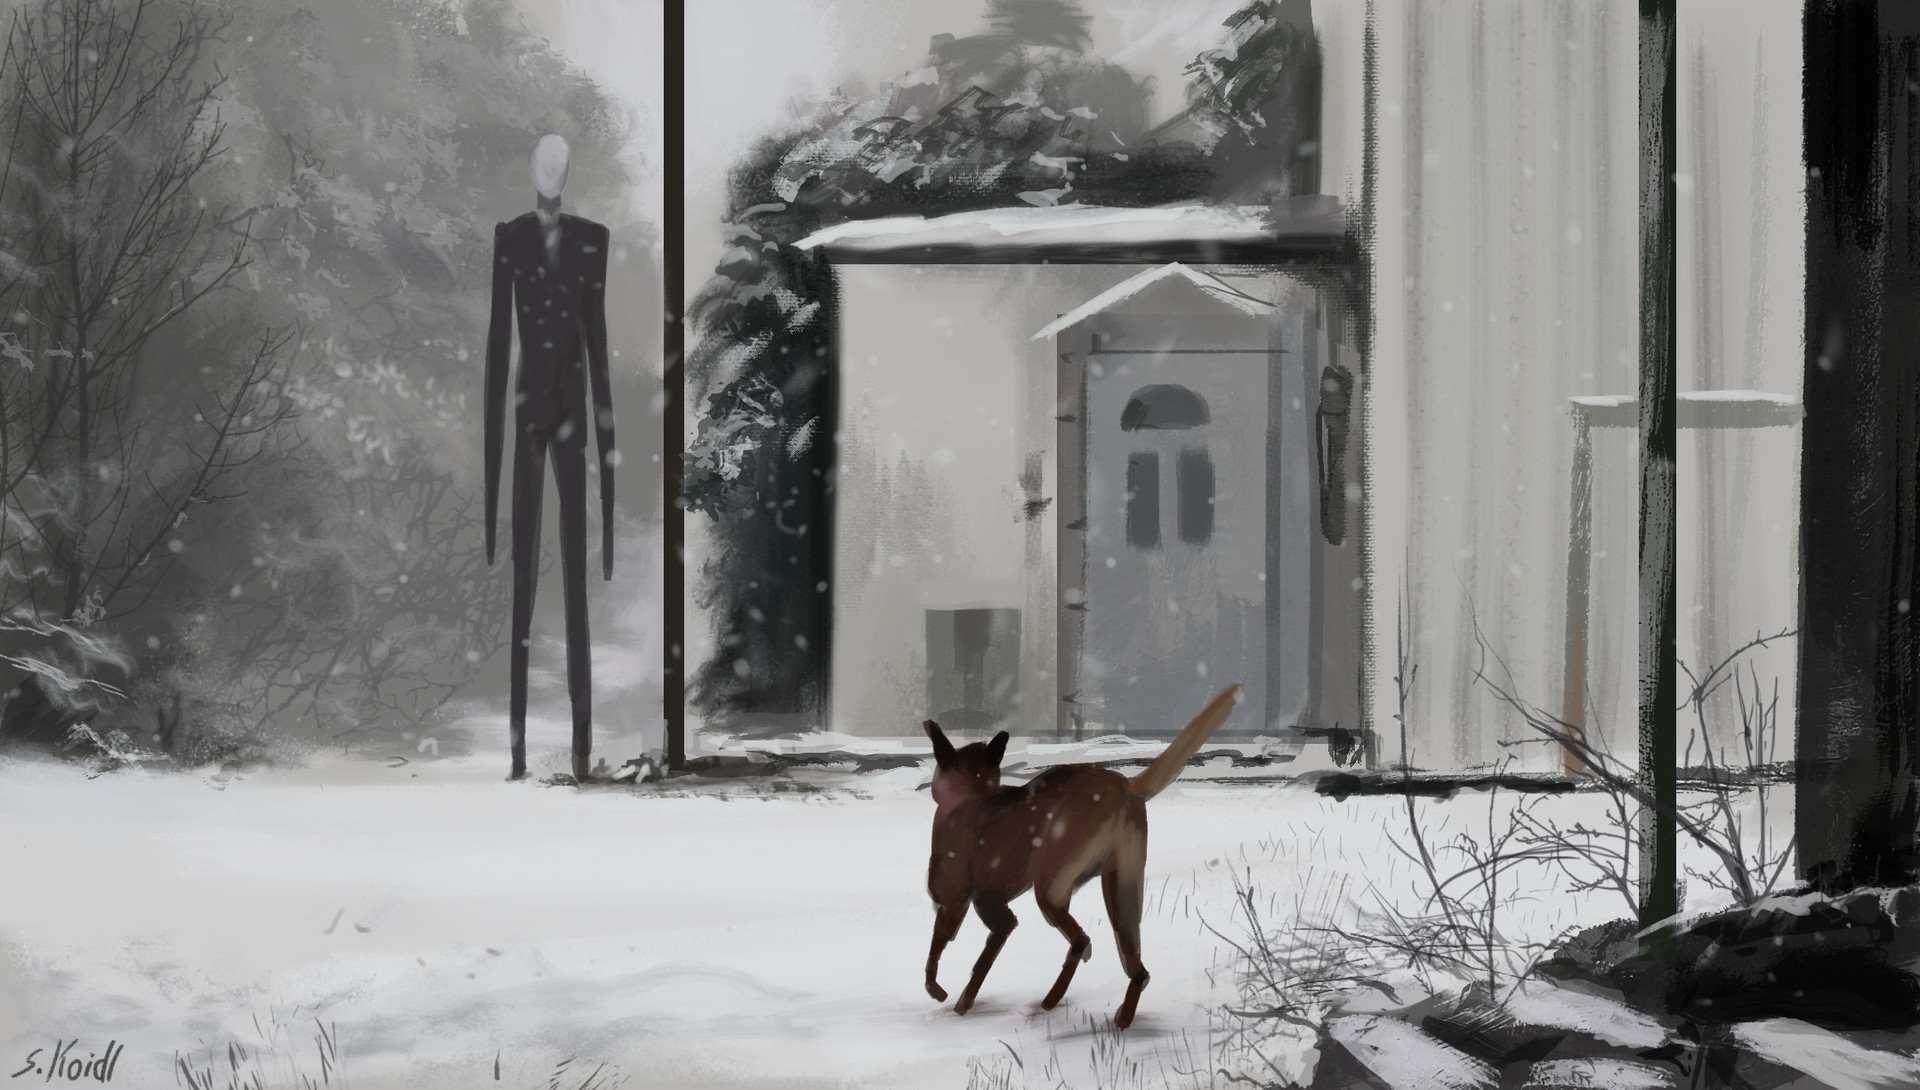 Stefan koidl, Non humanoid lifeform, arte digitale